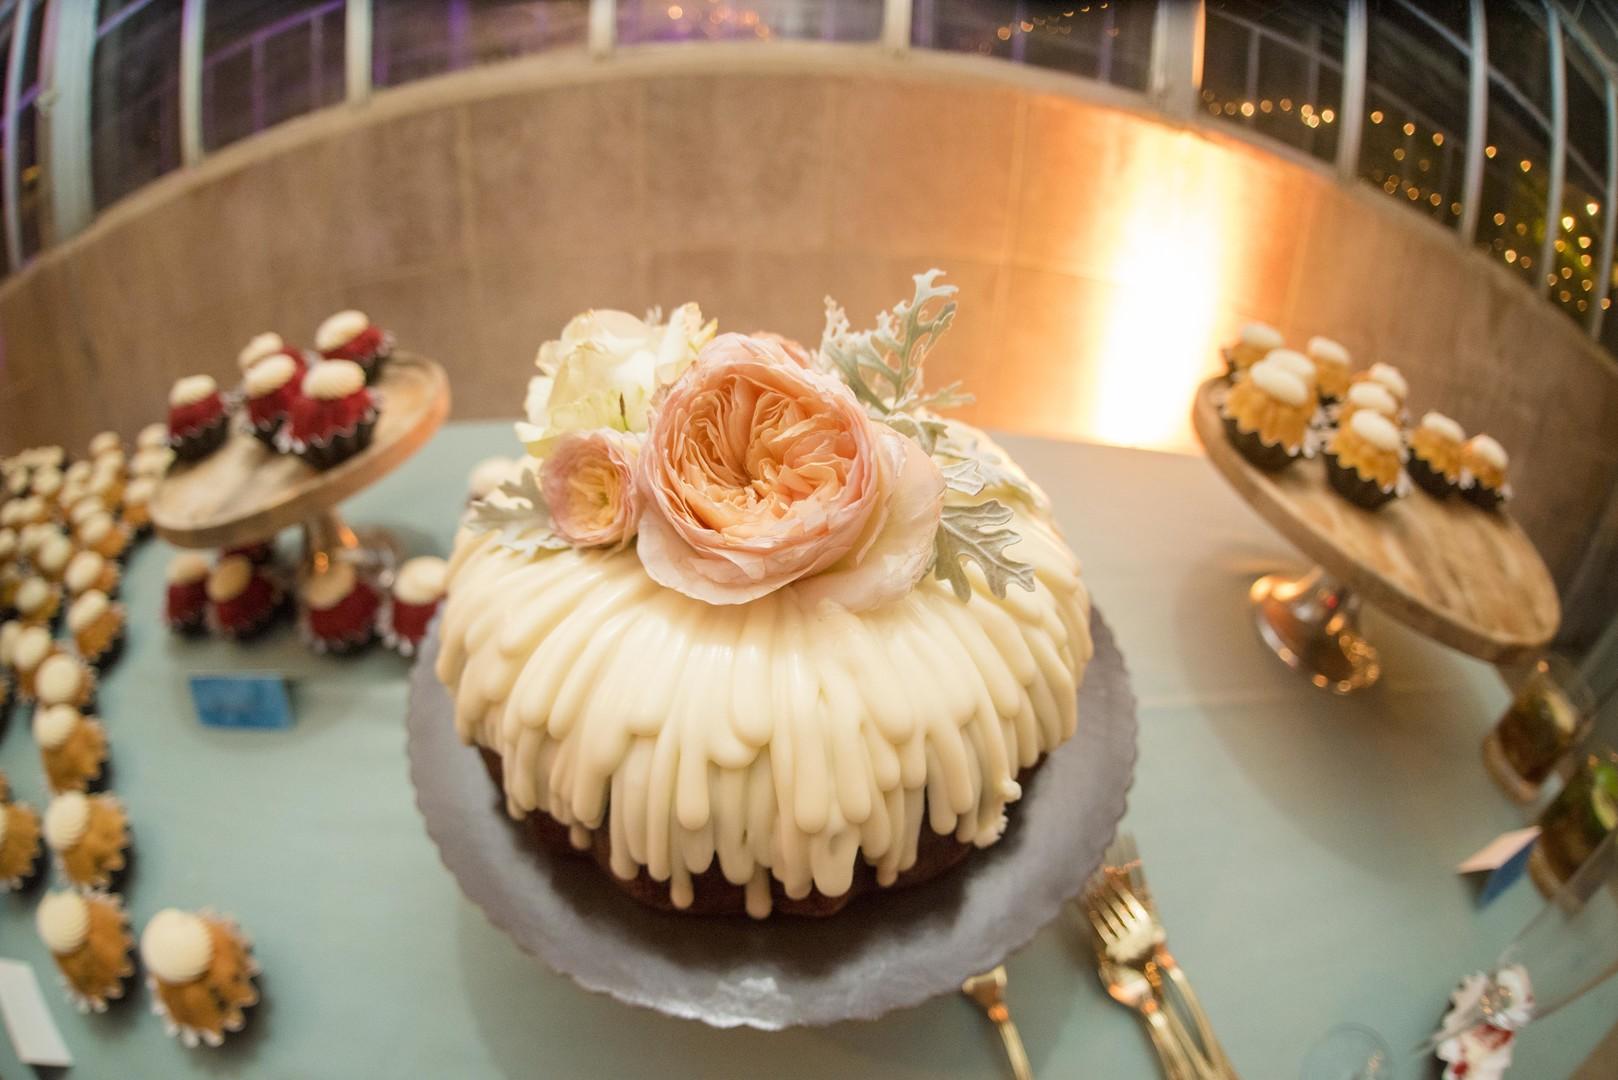 www.santabarbarawedding.com | Venue: Dos Pueblos Ranch | Photographer: ByCherry Photography | Event Designer: Elan Event Rentals | Wedding Cake